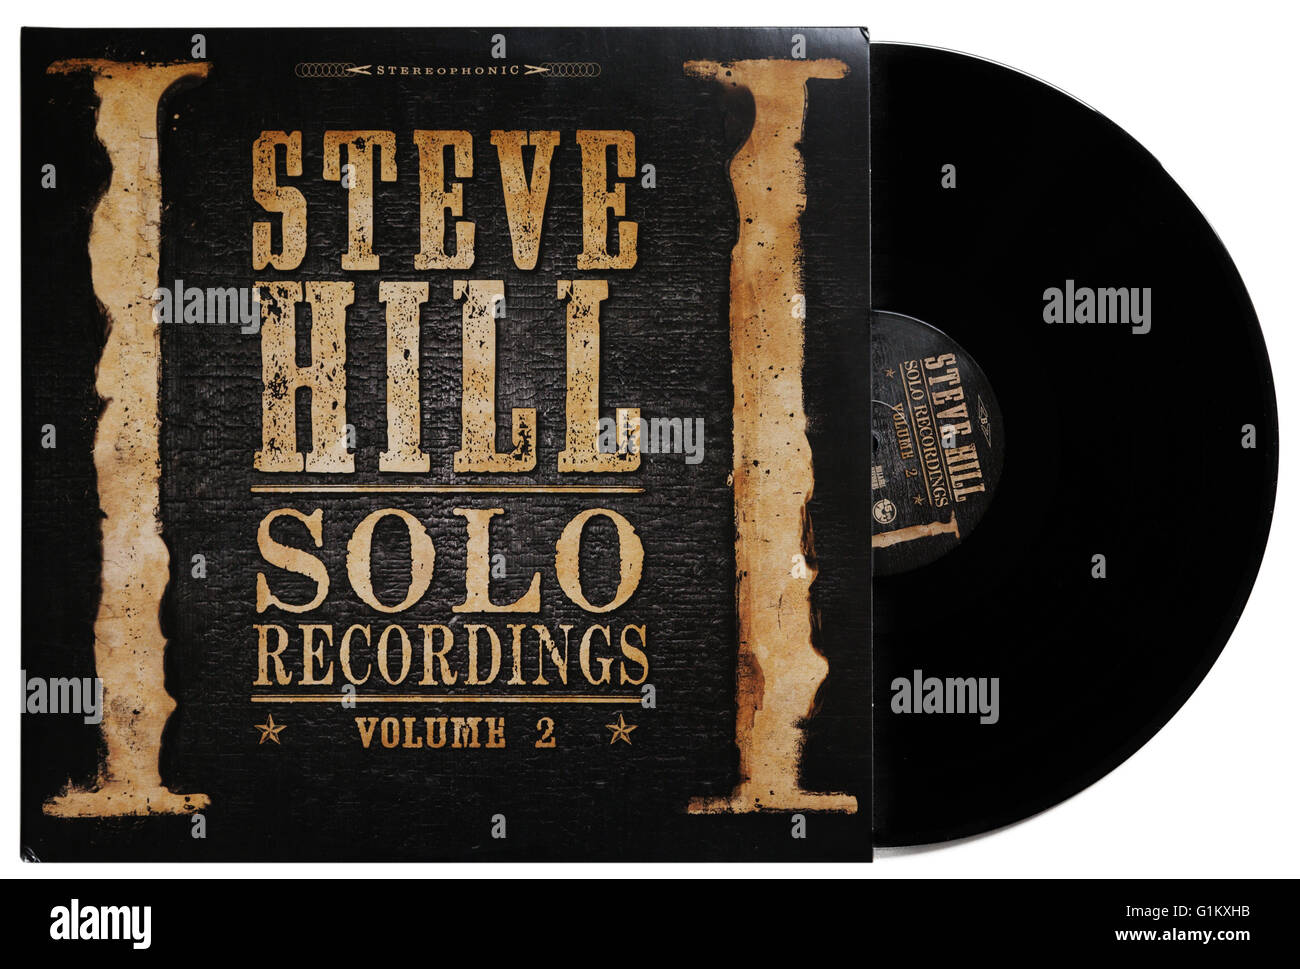 Steve Hill Solo Recordings Volume 2 album - Stock Image